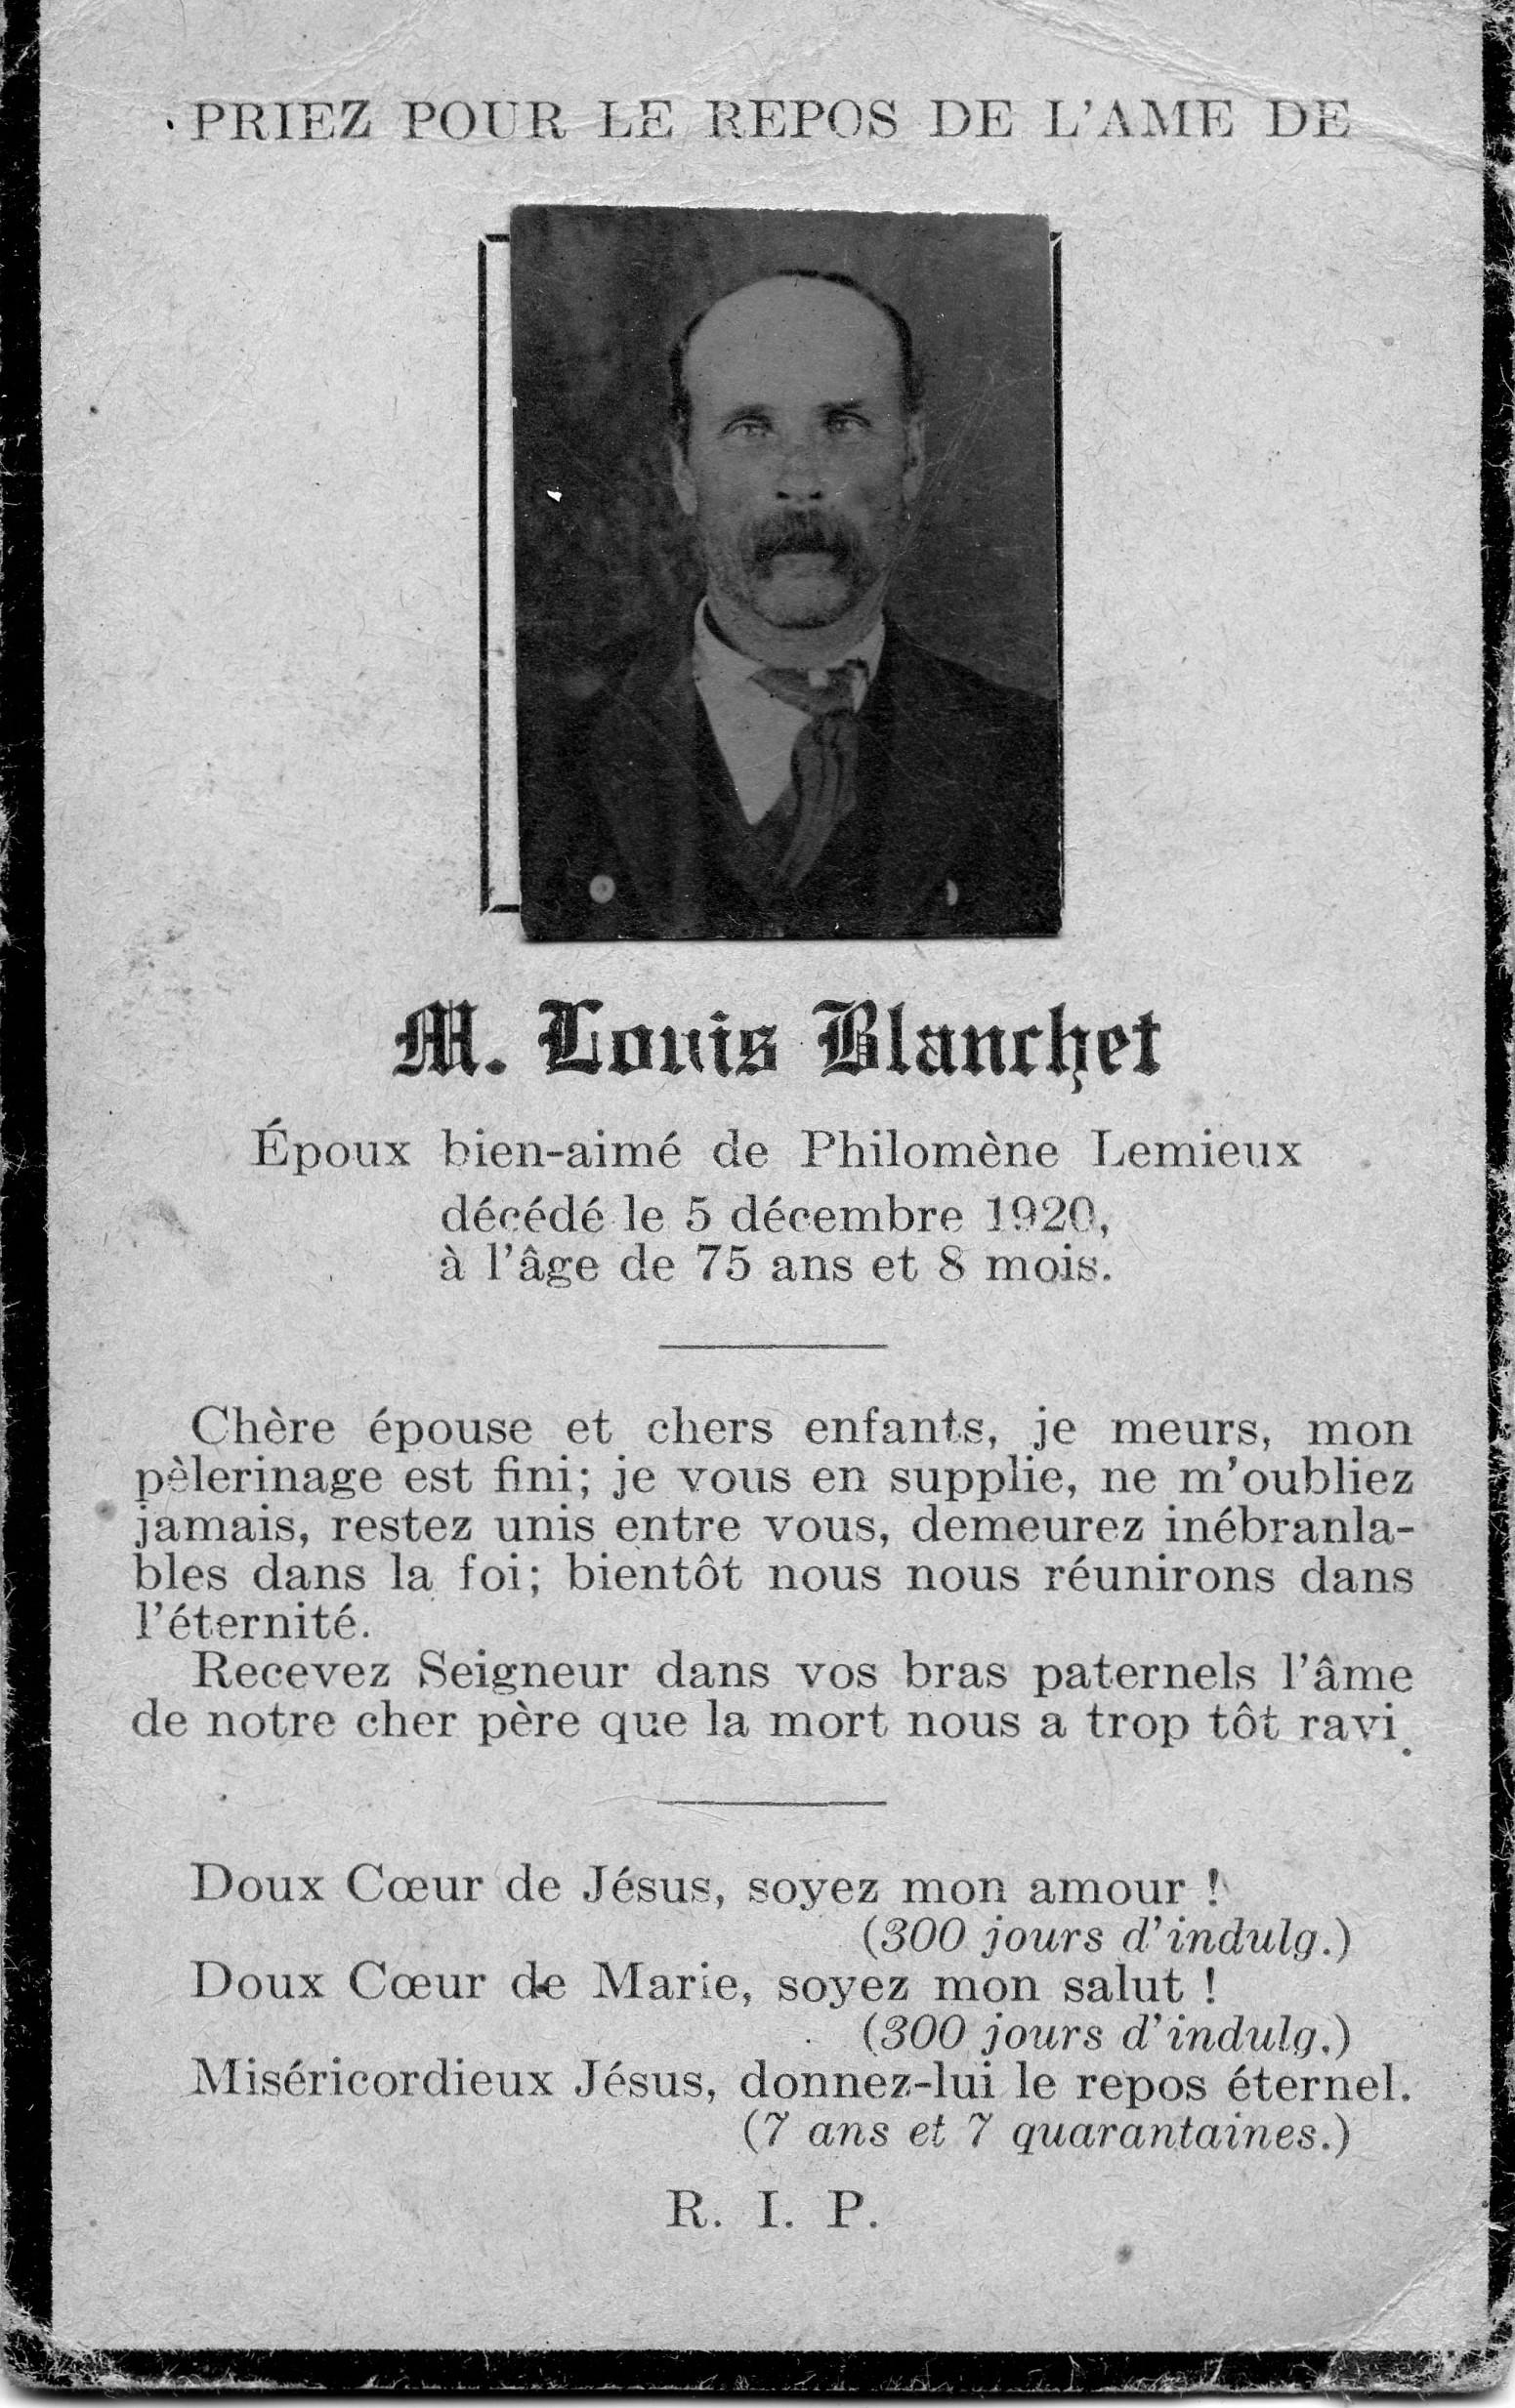 Louis Blanchet 1845-1920